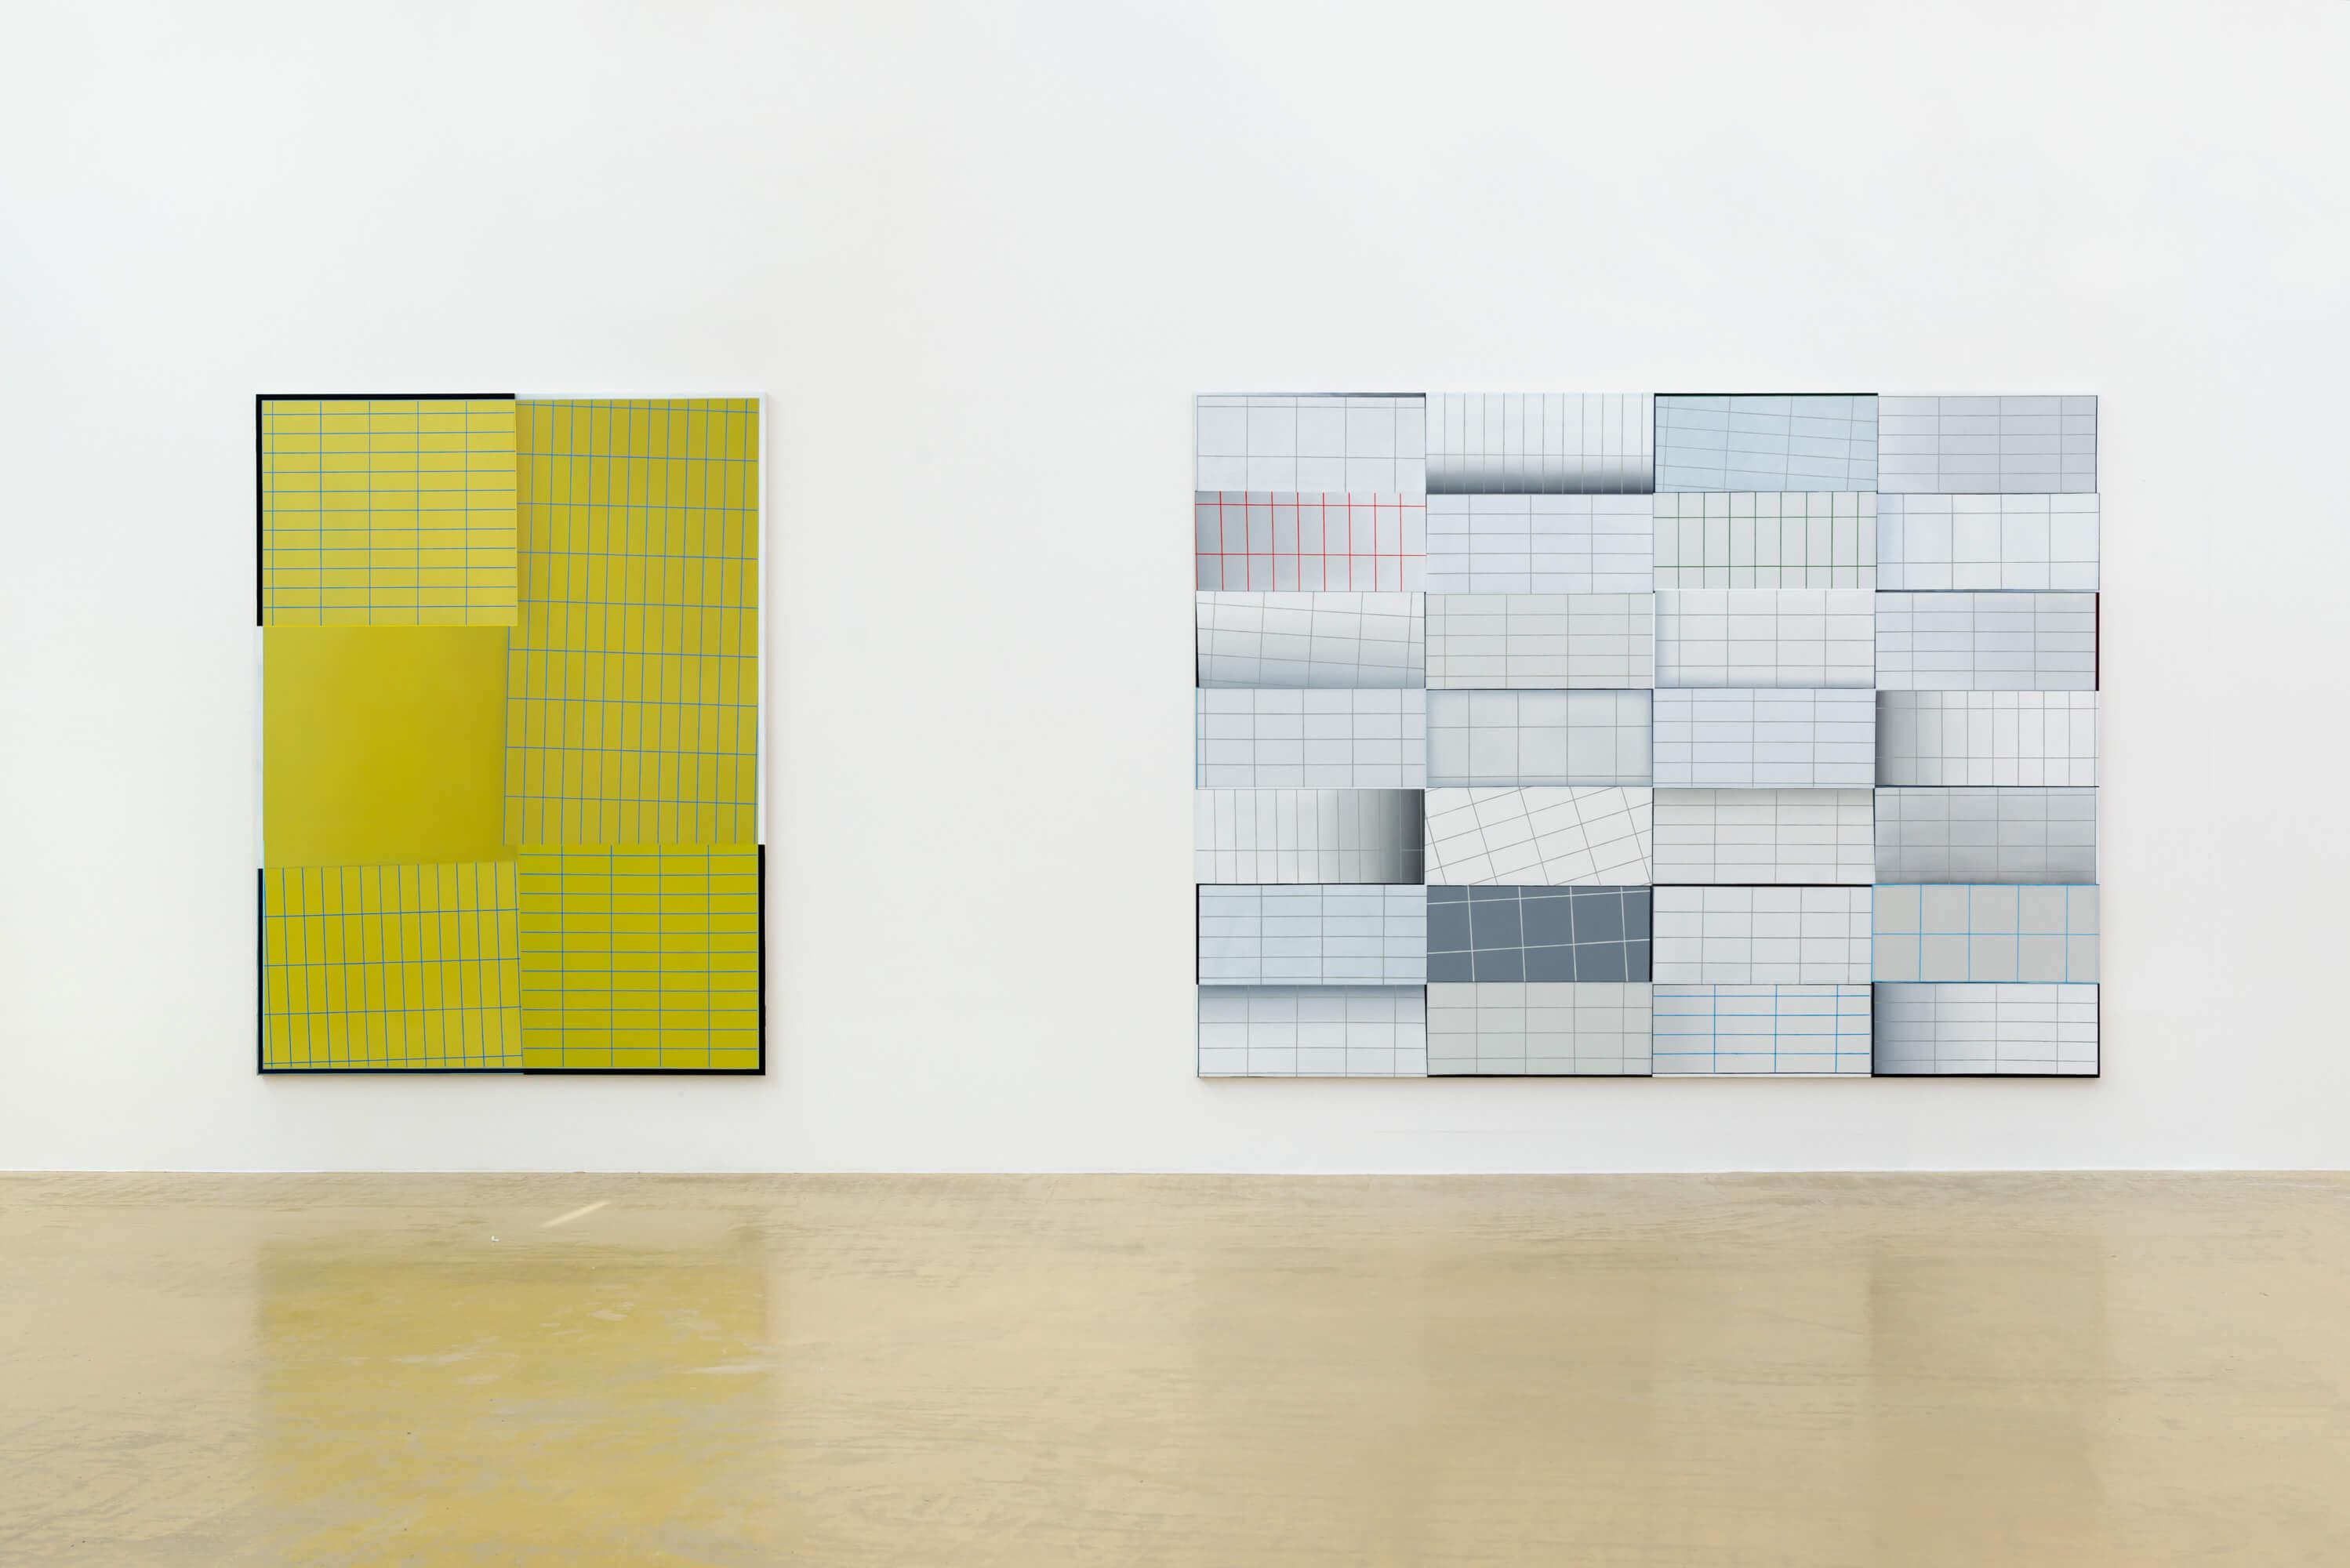 Kunstwerk - Sammlung Klein - Nussdorf - Museum - Kunst - Art - Baden-Württemberg - Hängung #19 - Enrico Bach - Franziska Holstein - Ayan Farah -Malerei - PS Serie